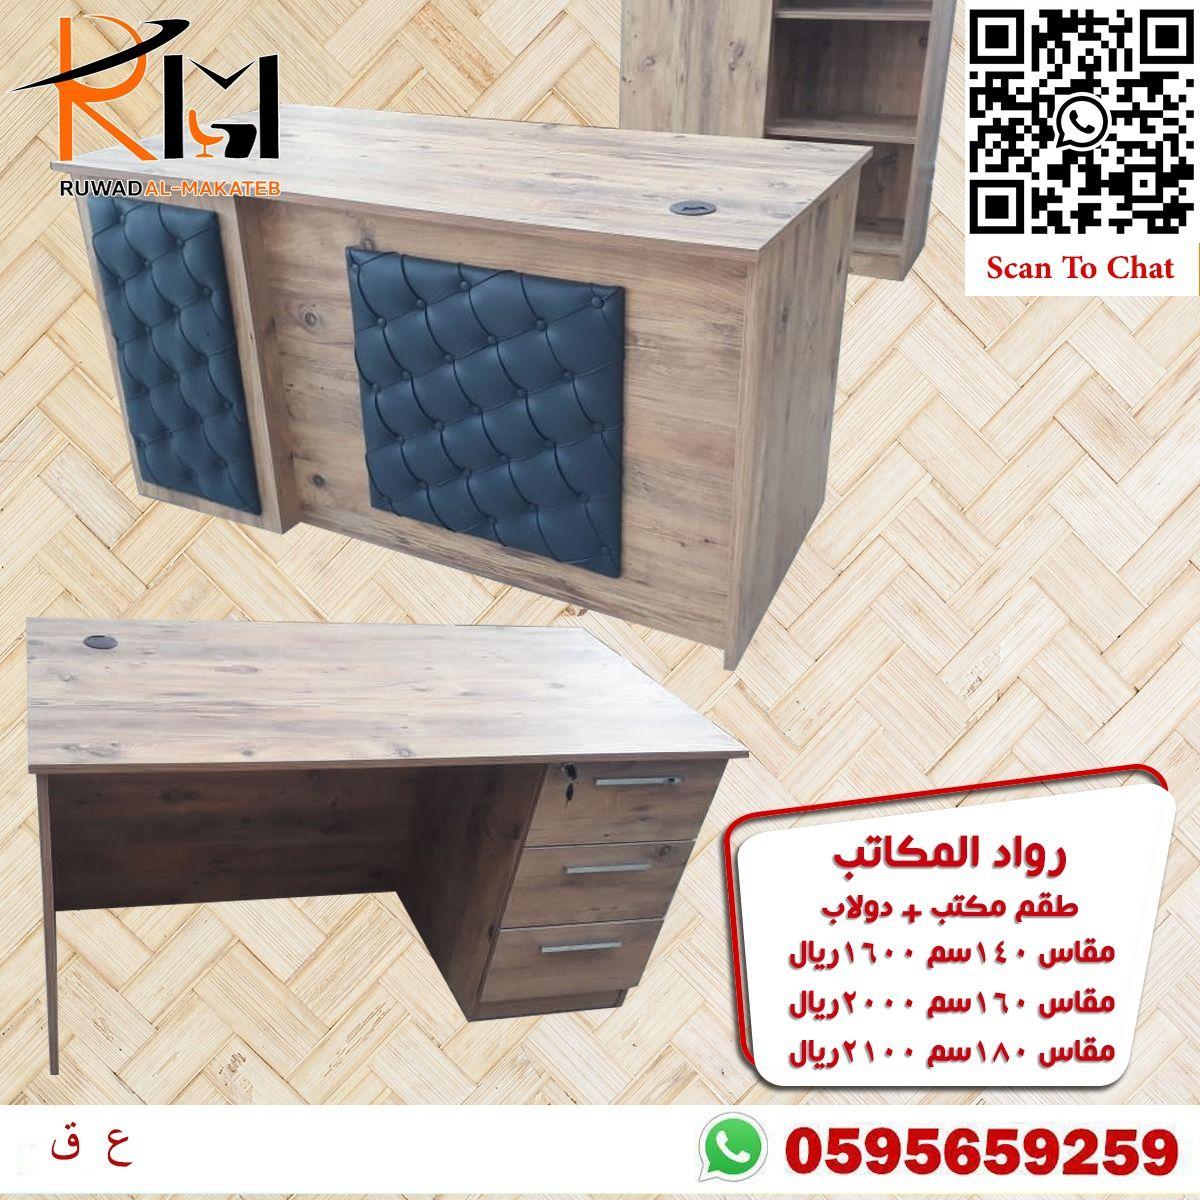 مكتب شيك دولاب Outdoor Storage Box Outdoor Storage Home Decor